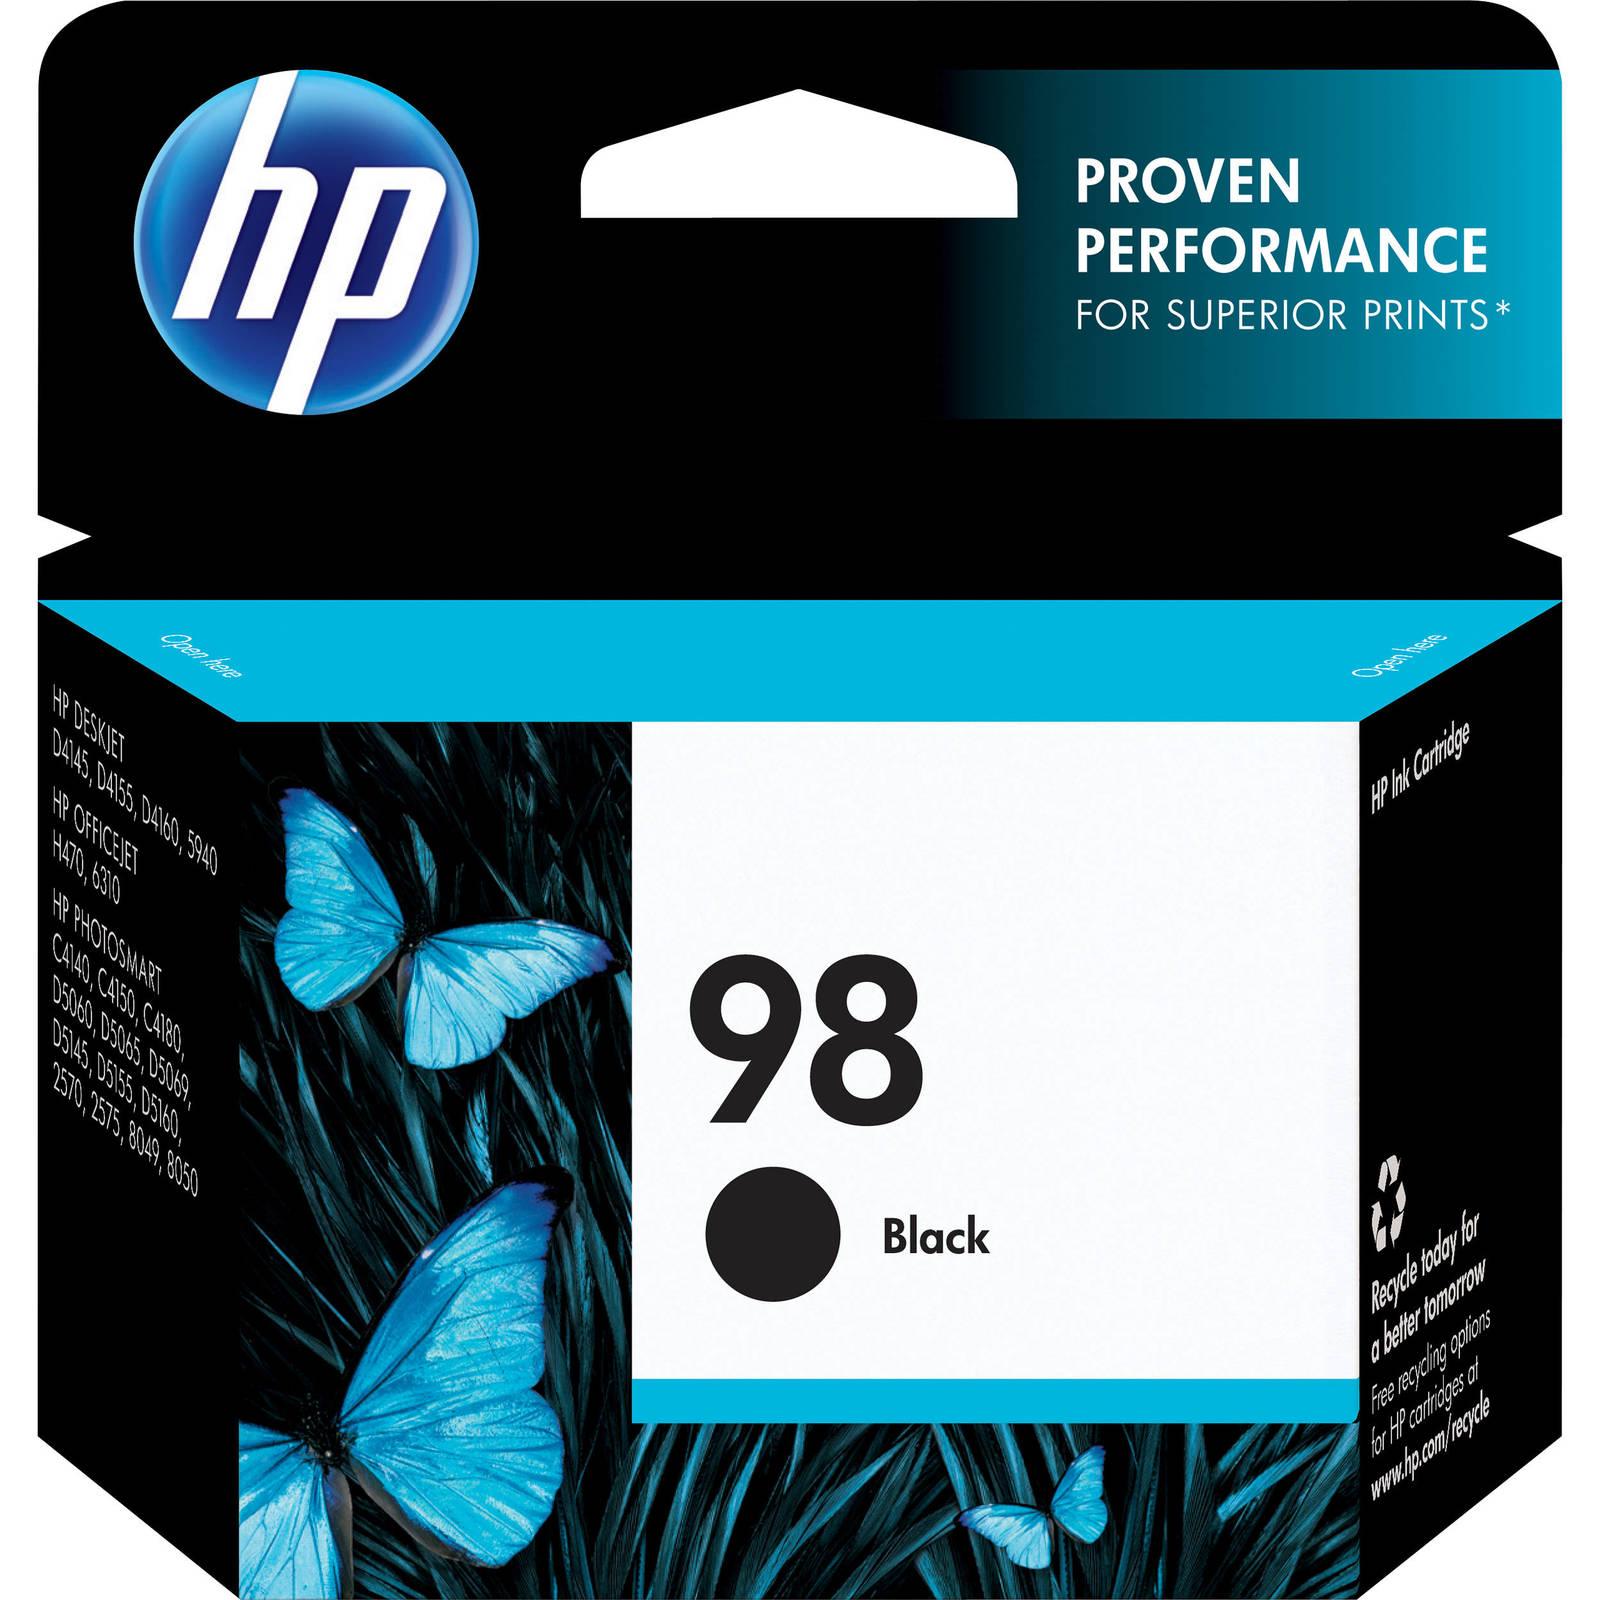 HP 98 Black Ink Cartridge image